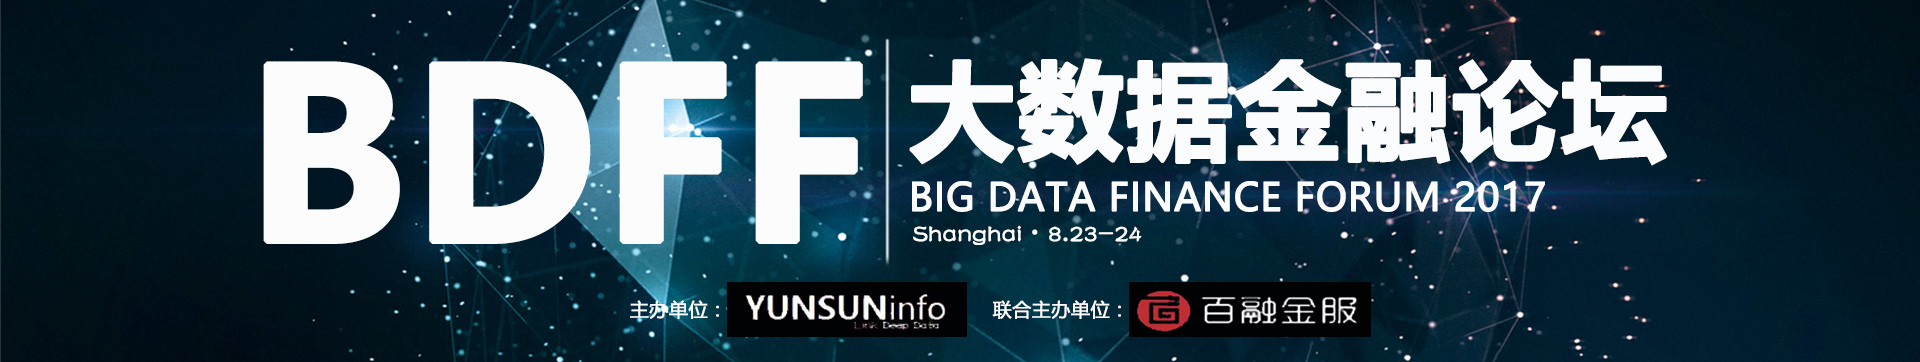 BDFF 2017大数据金融论坛